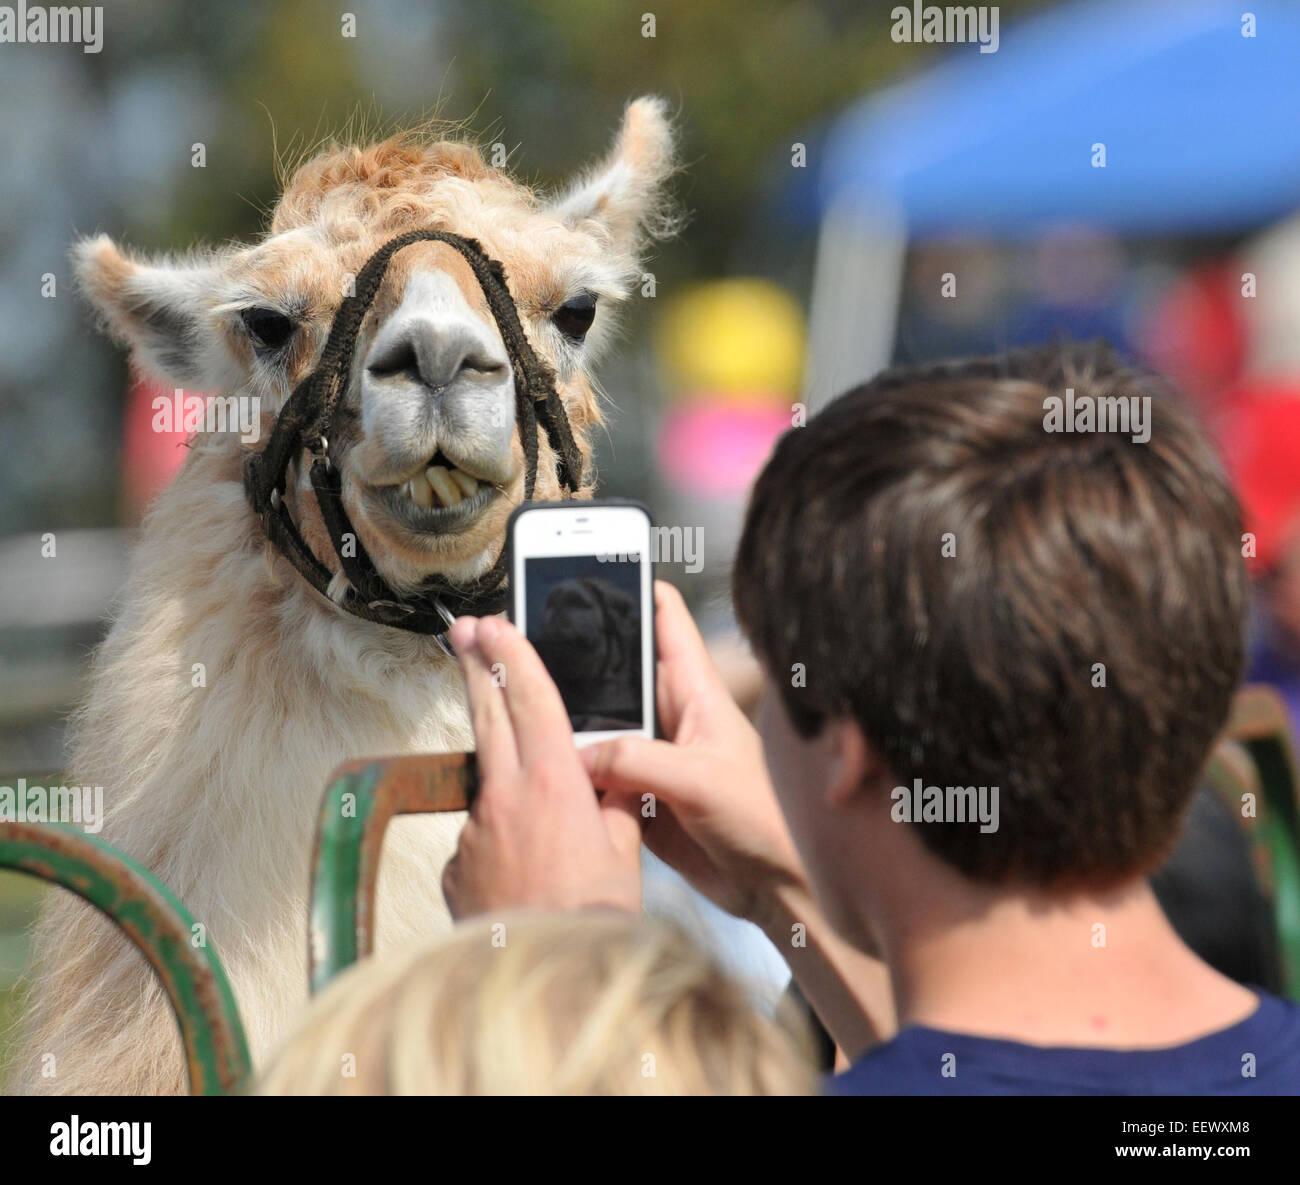 Spiffy Stockfotos & Spiffy Bilder - Alamy